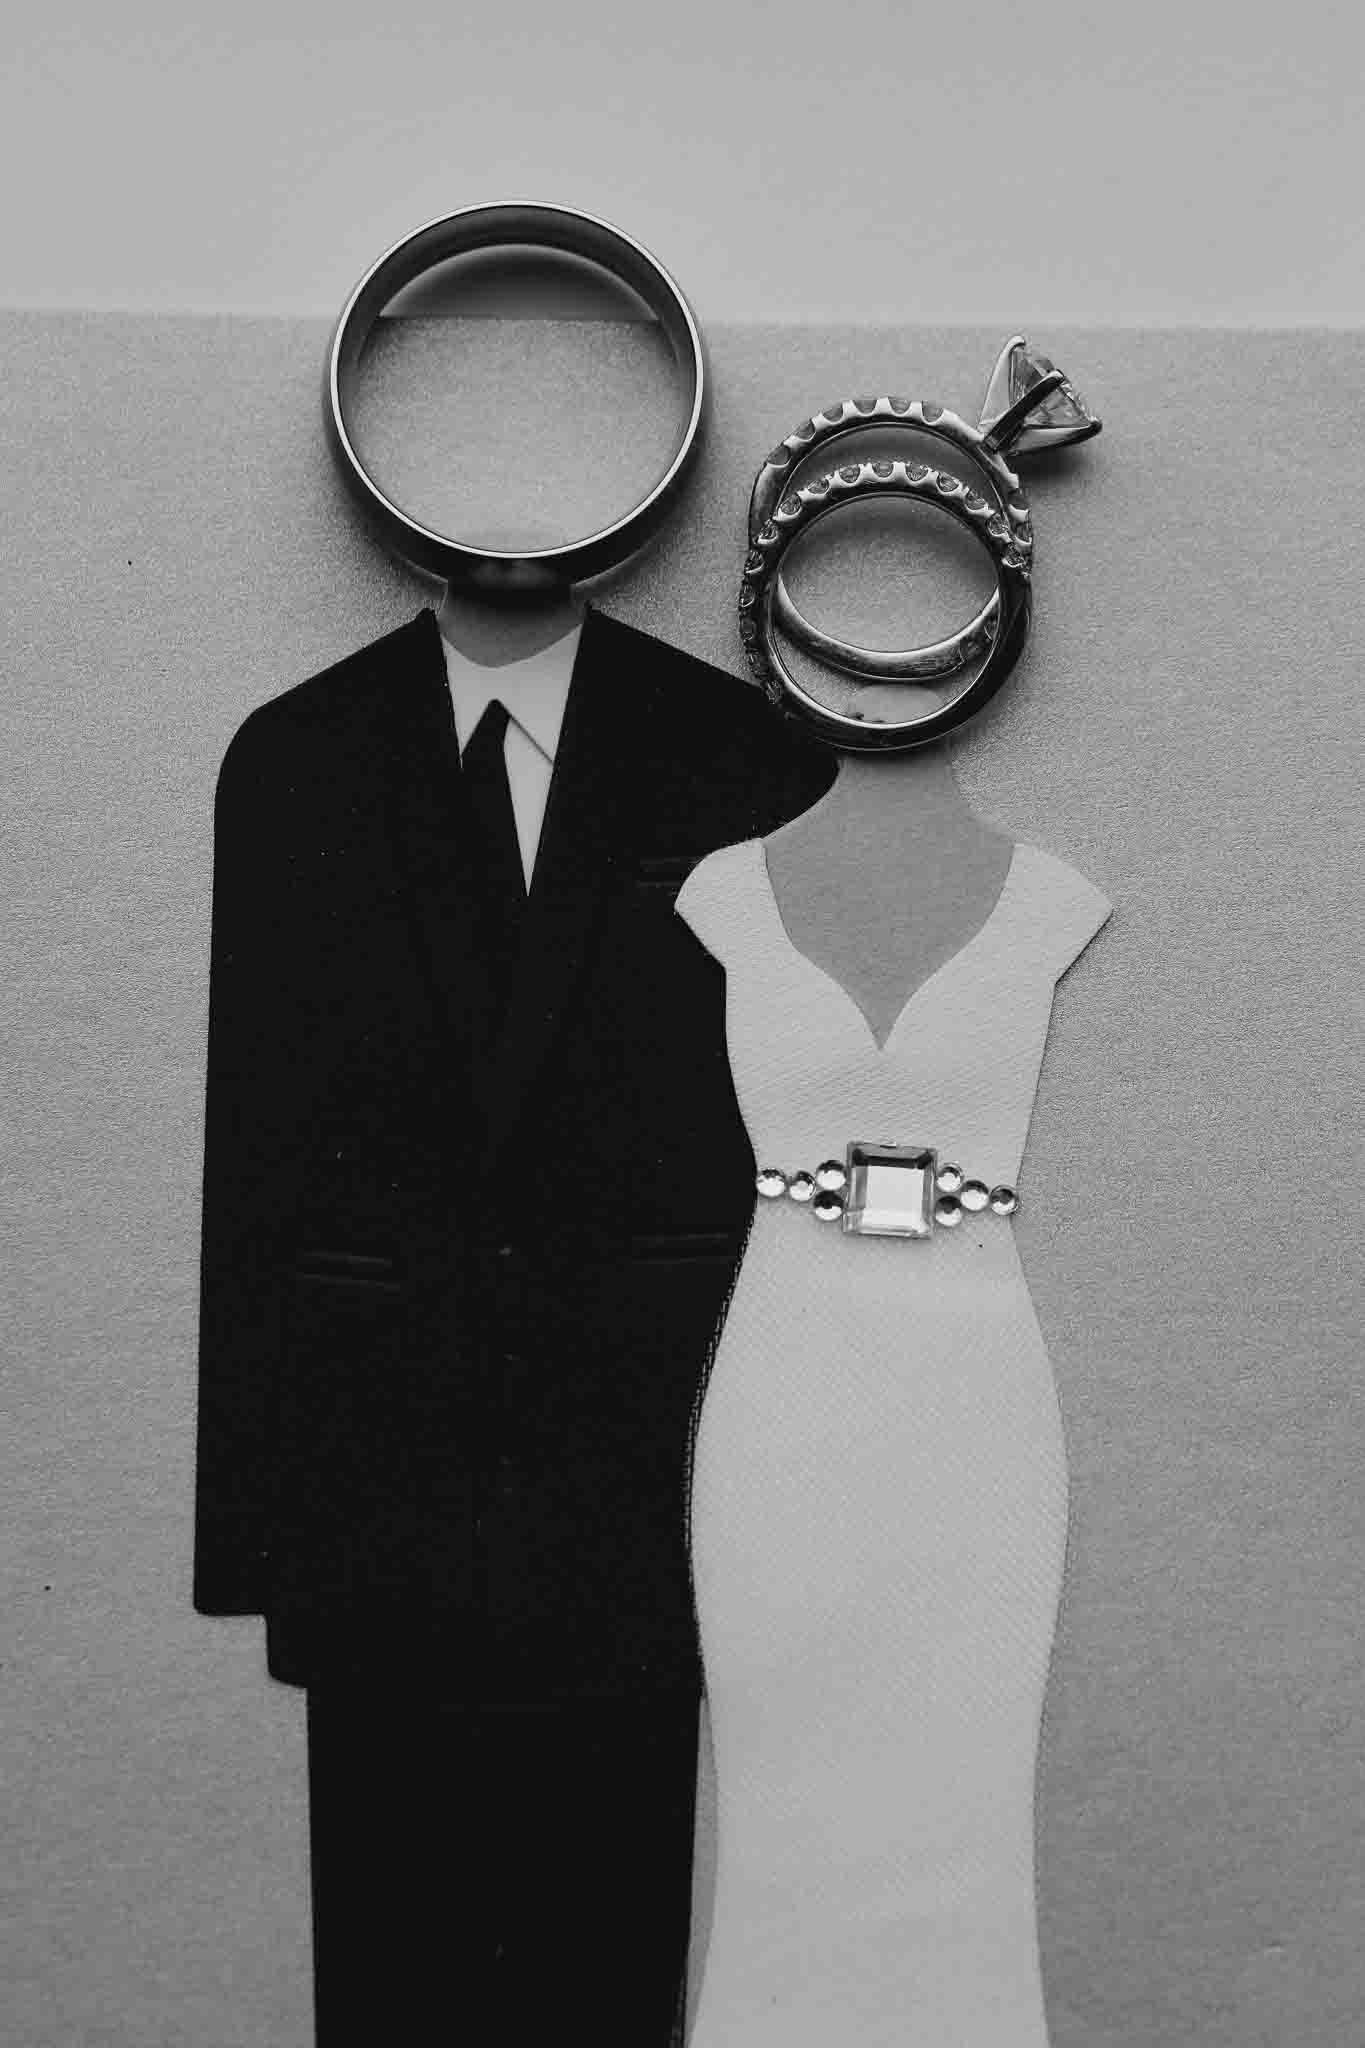 Broomfield CO wedding rings